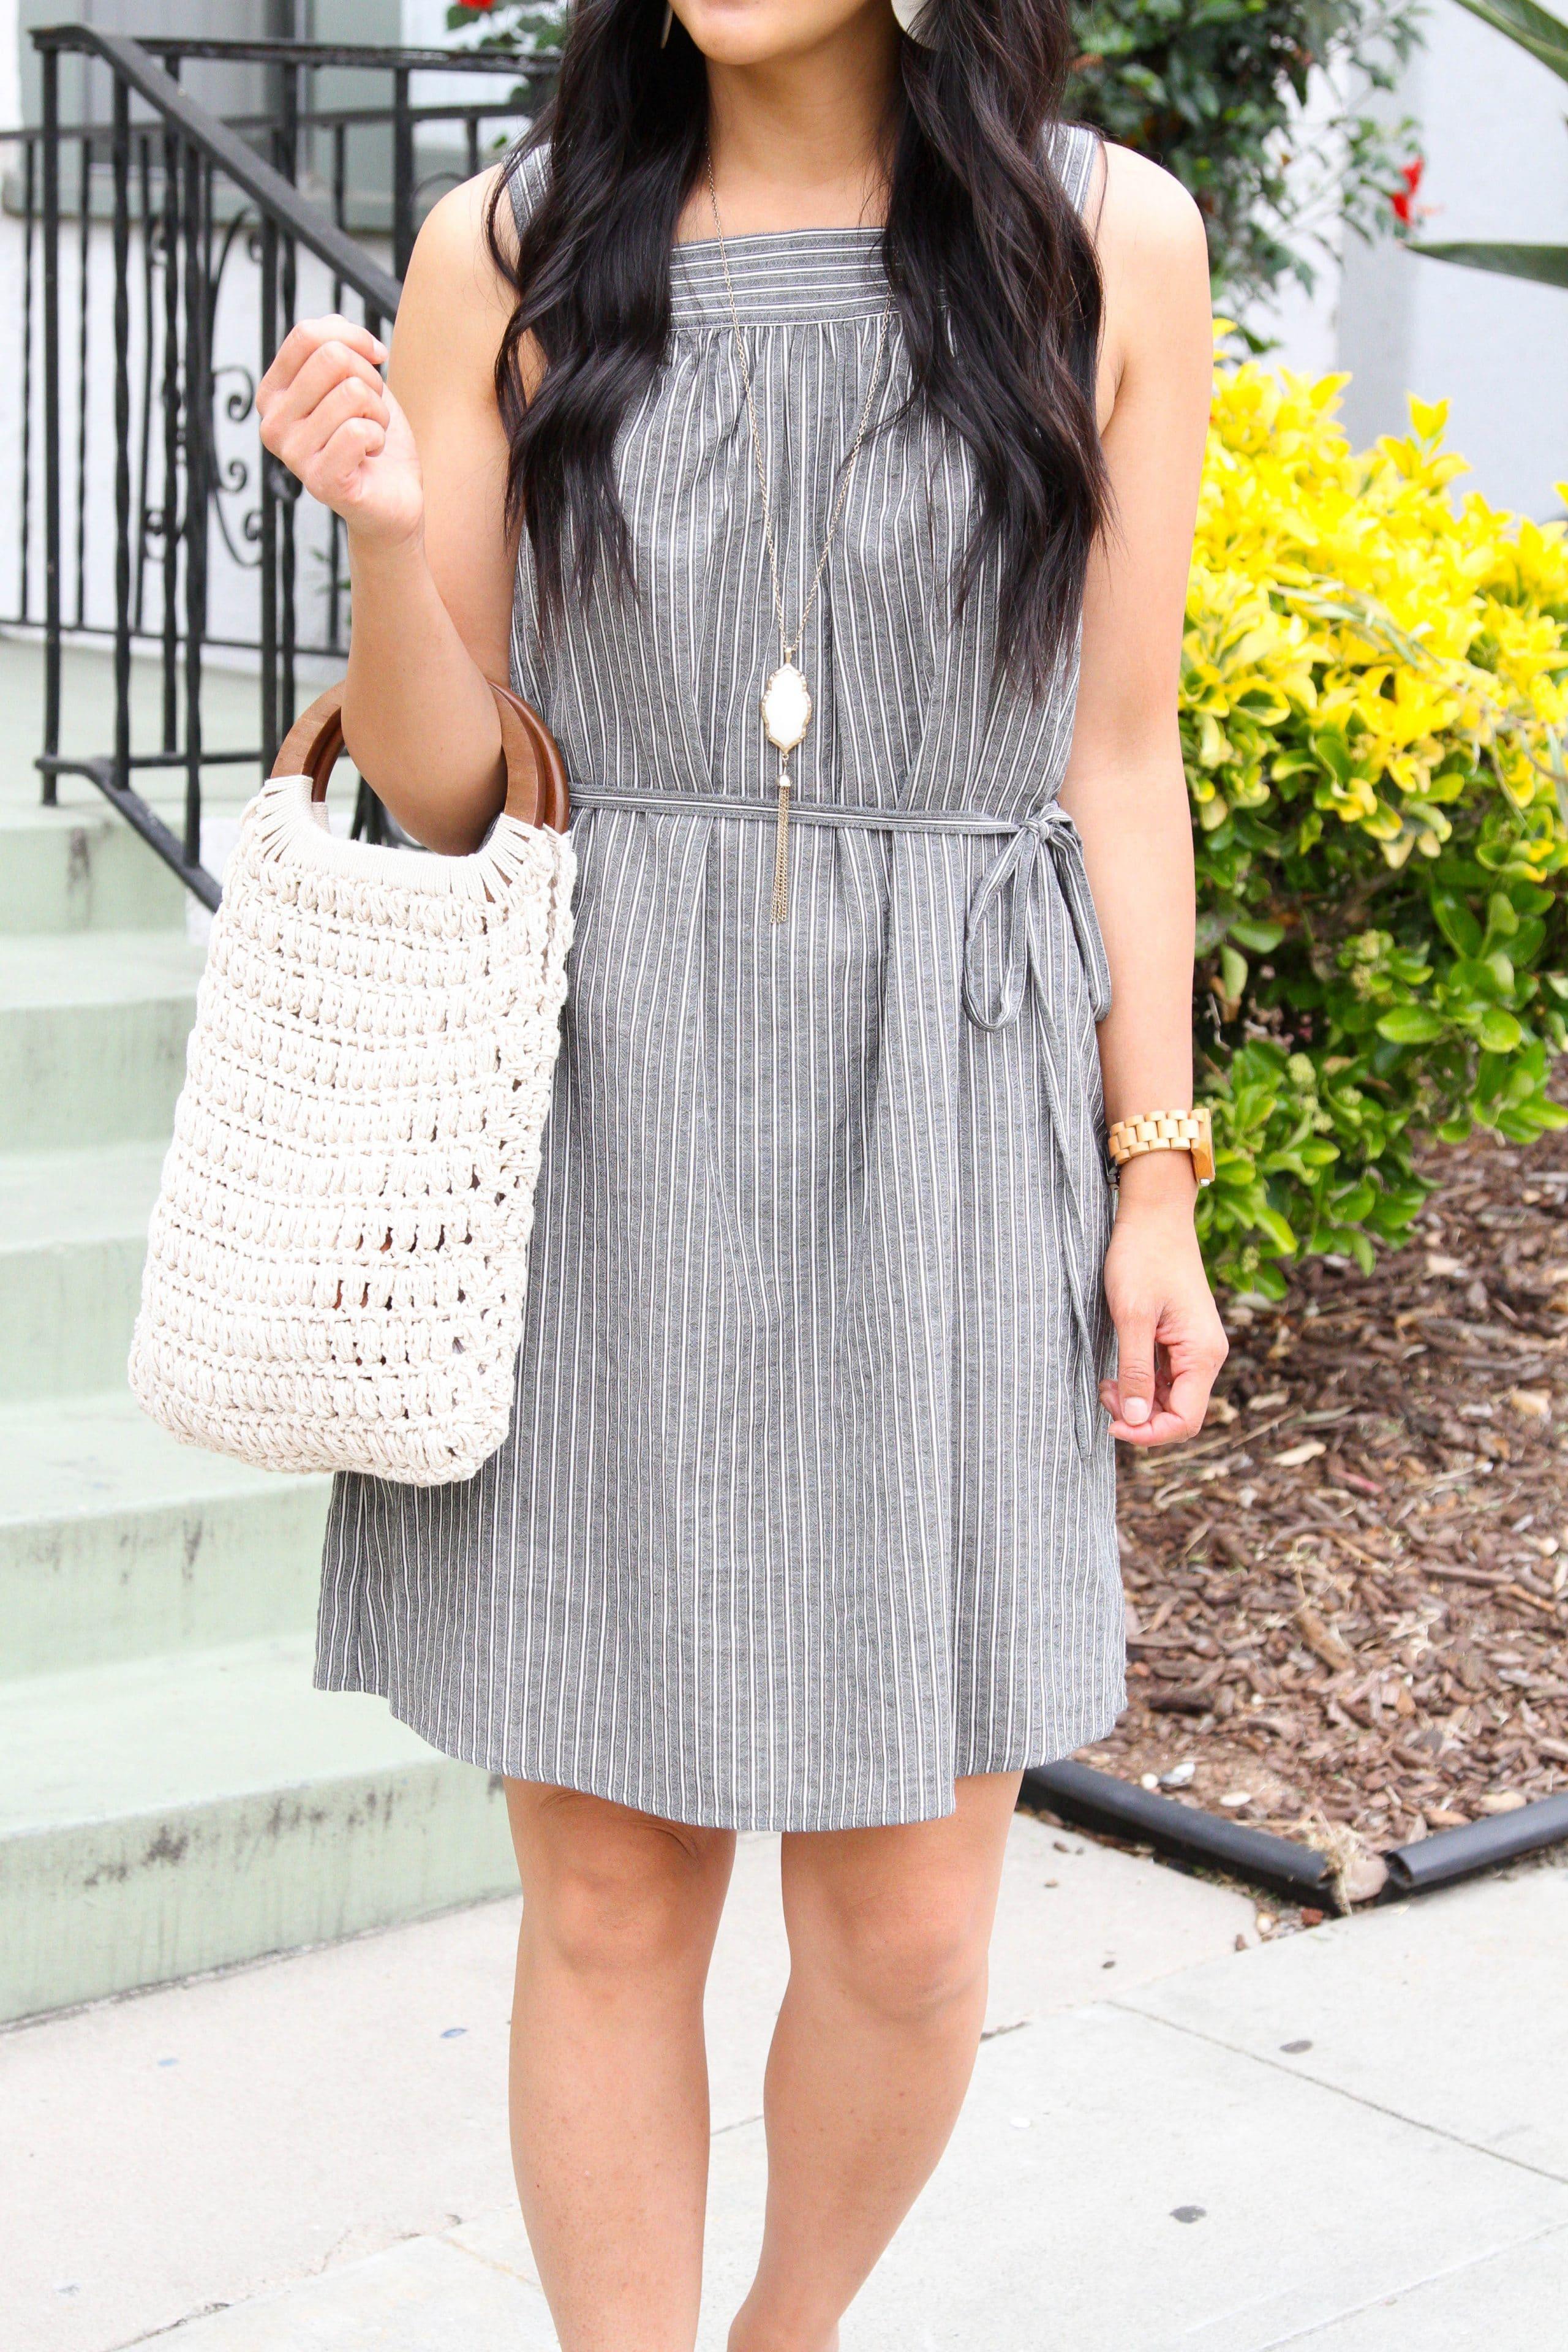 grey and white striped dress + long pendant necklace + white macrame handbag